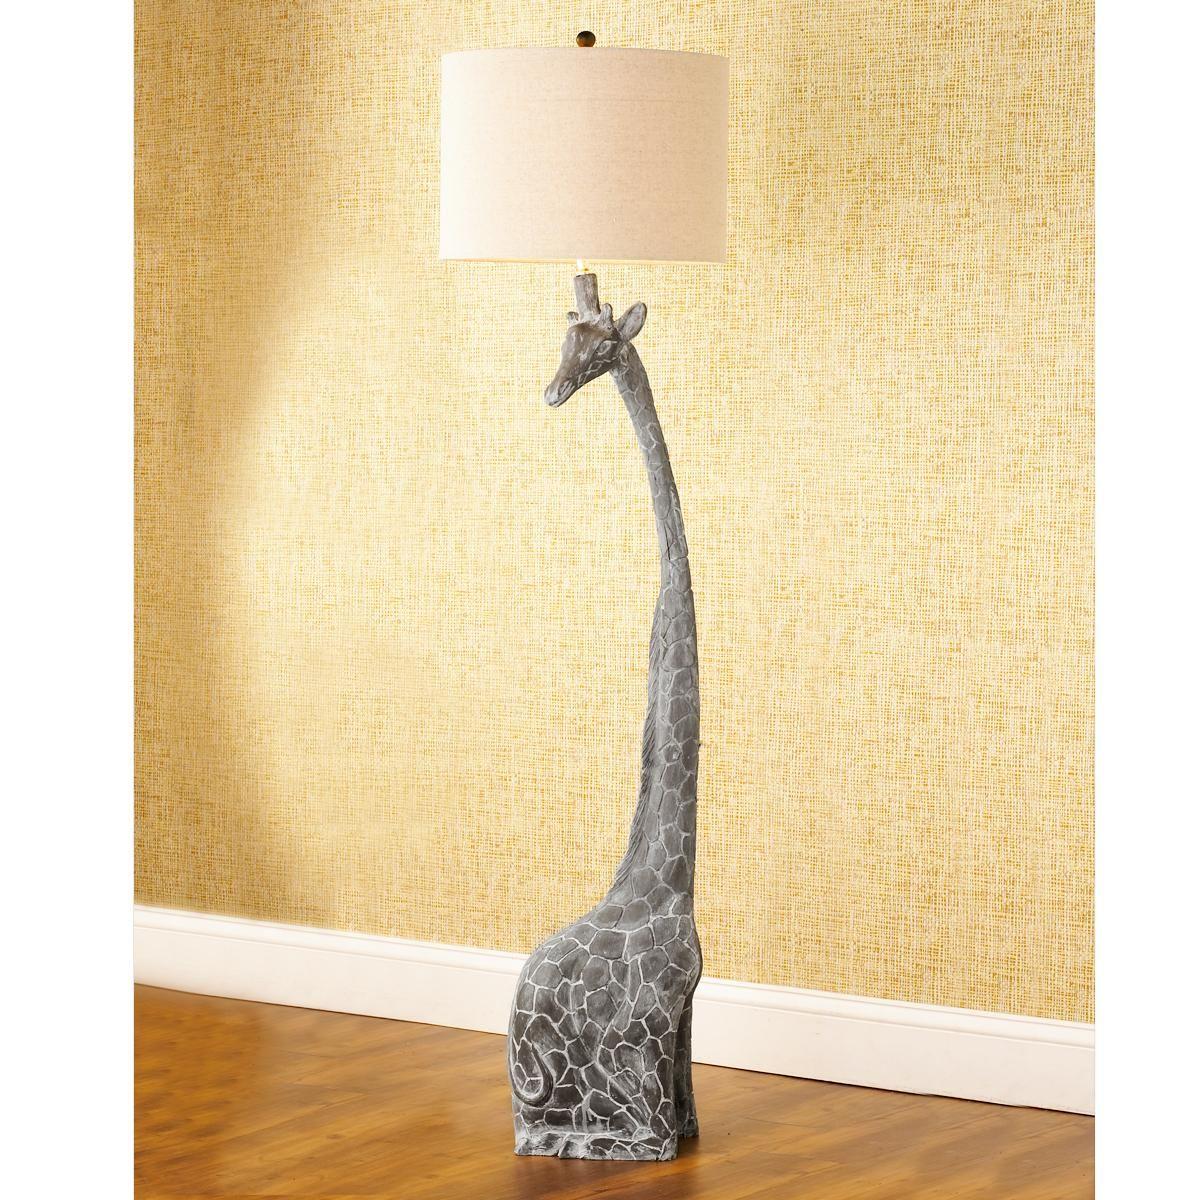 Giraffe lamp shade - Funky And Different And Fufills My Giraffe Love Floor Lamp